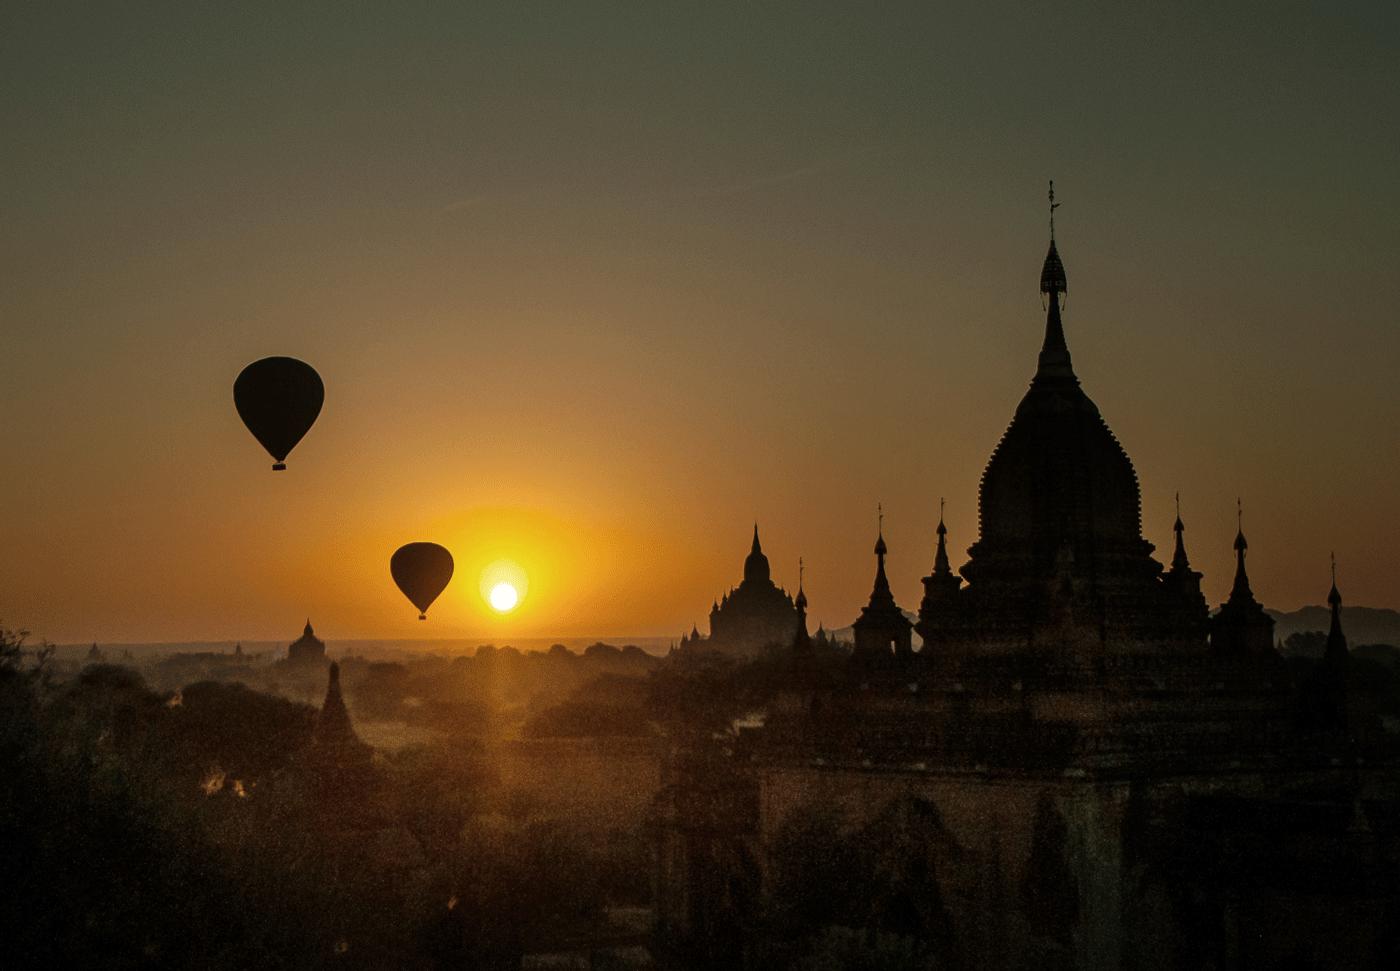 Hot Air Balloons in Bagan  Photo Cr : Belmond Road to Mandalay